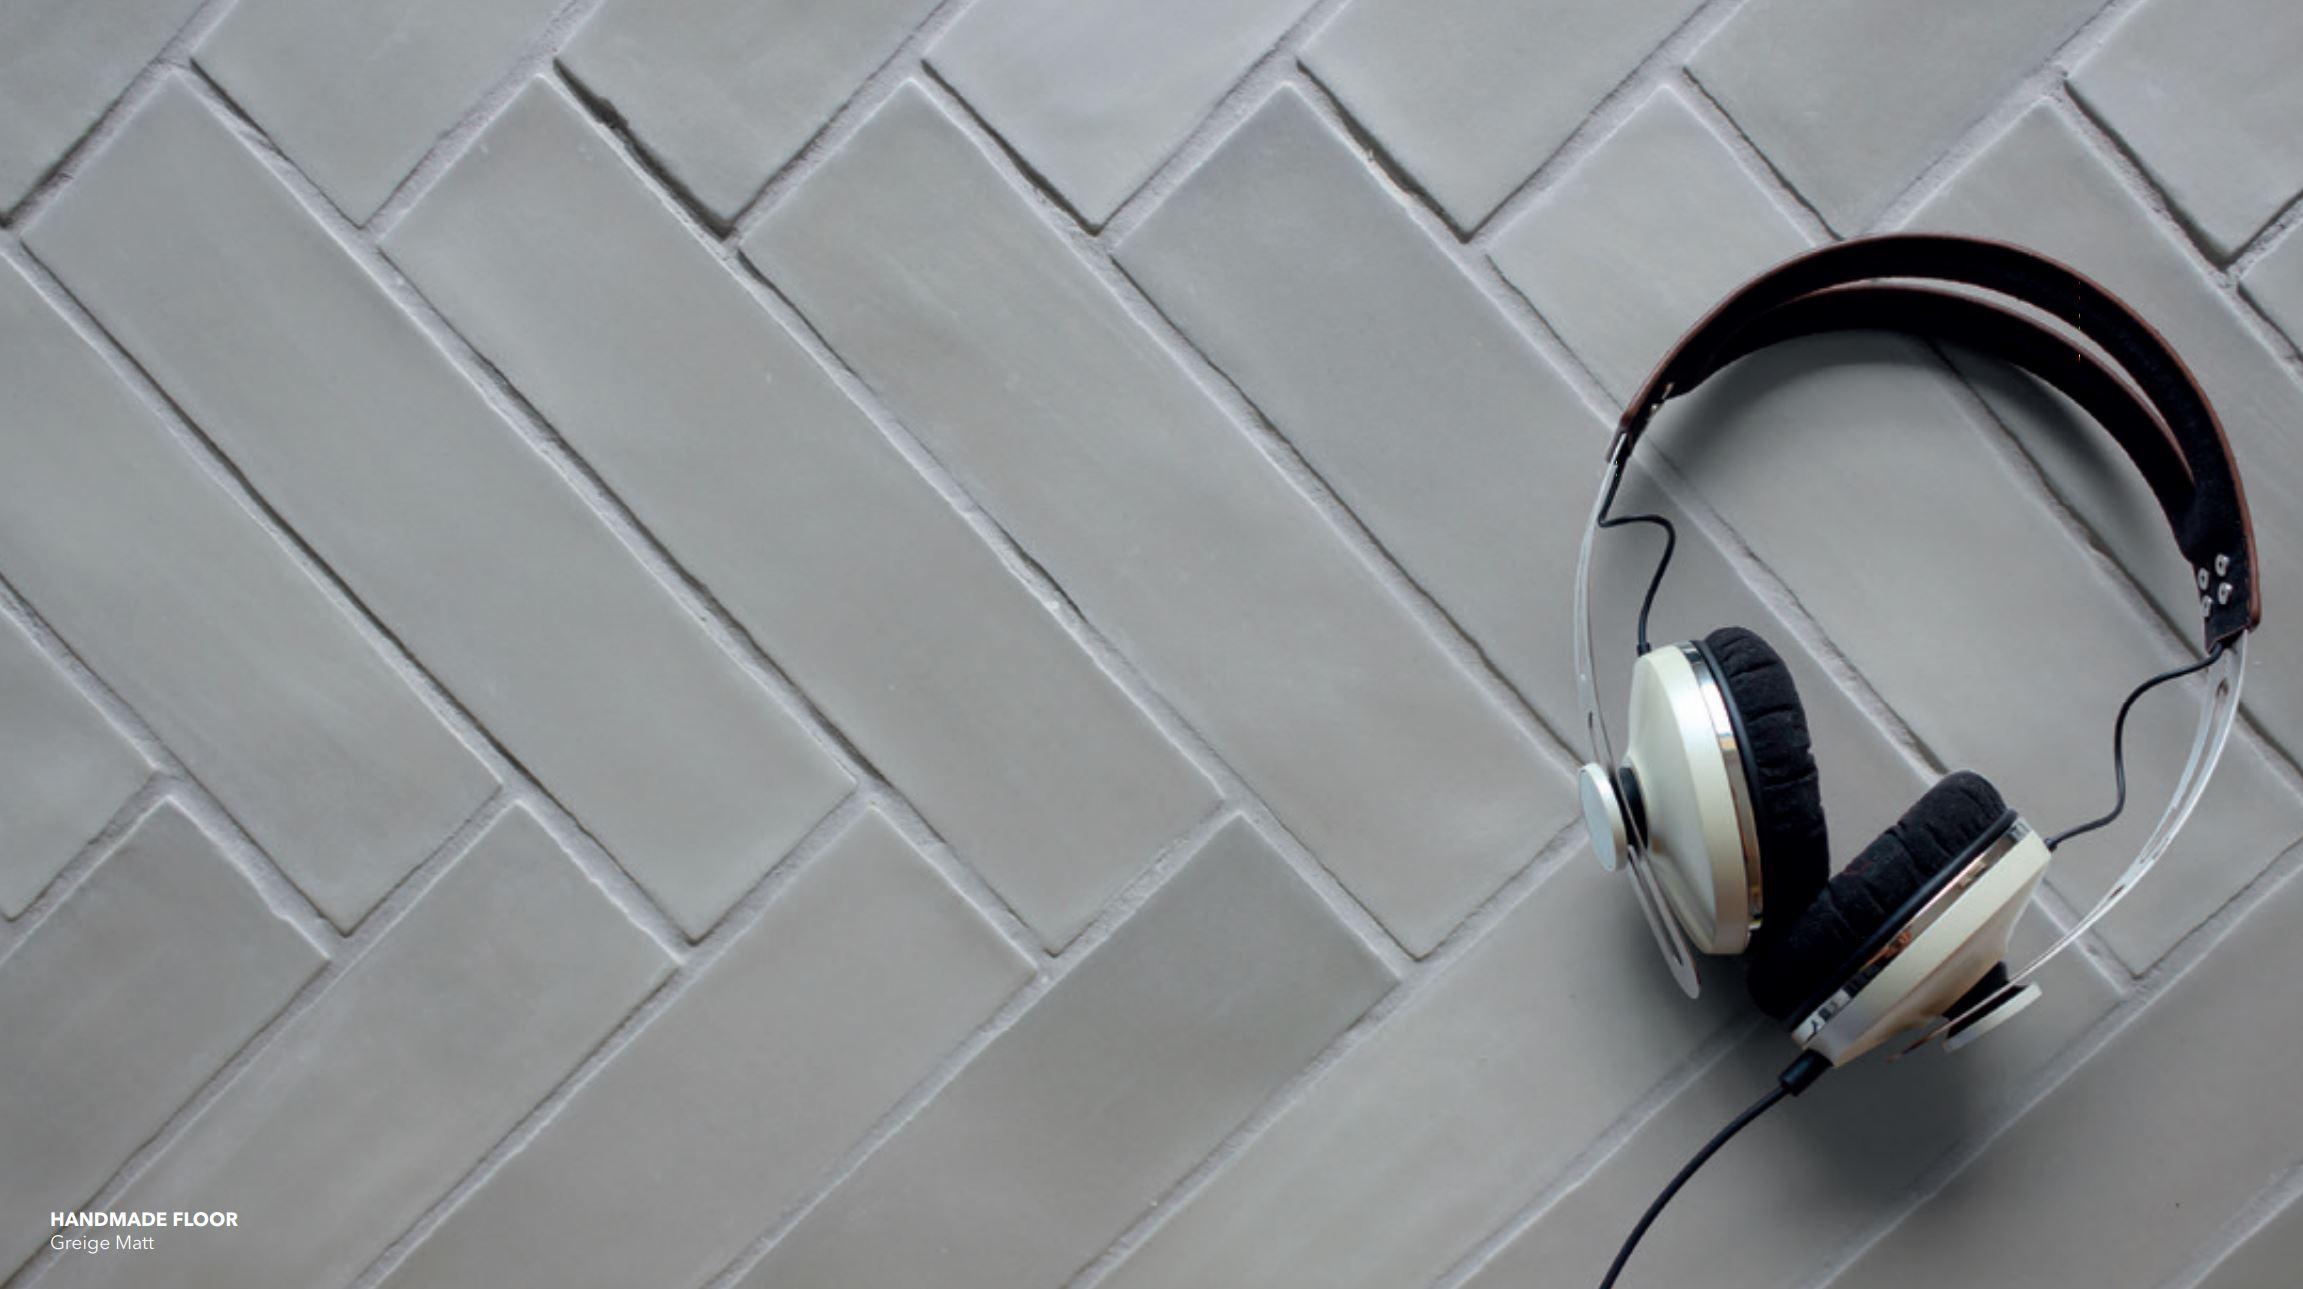 Briques Handmade Floor Tile Greige Matte